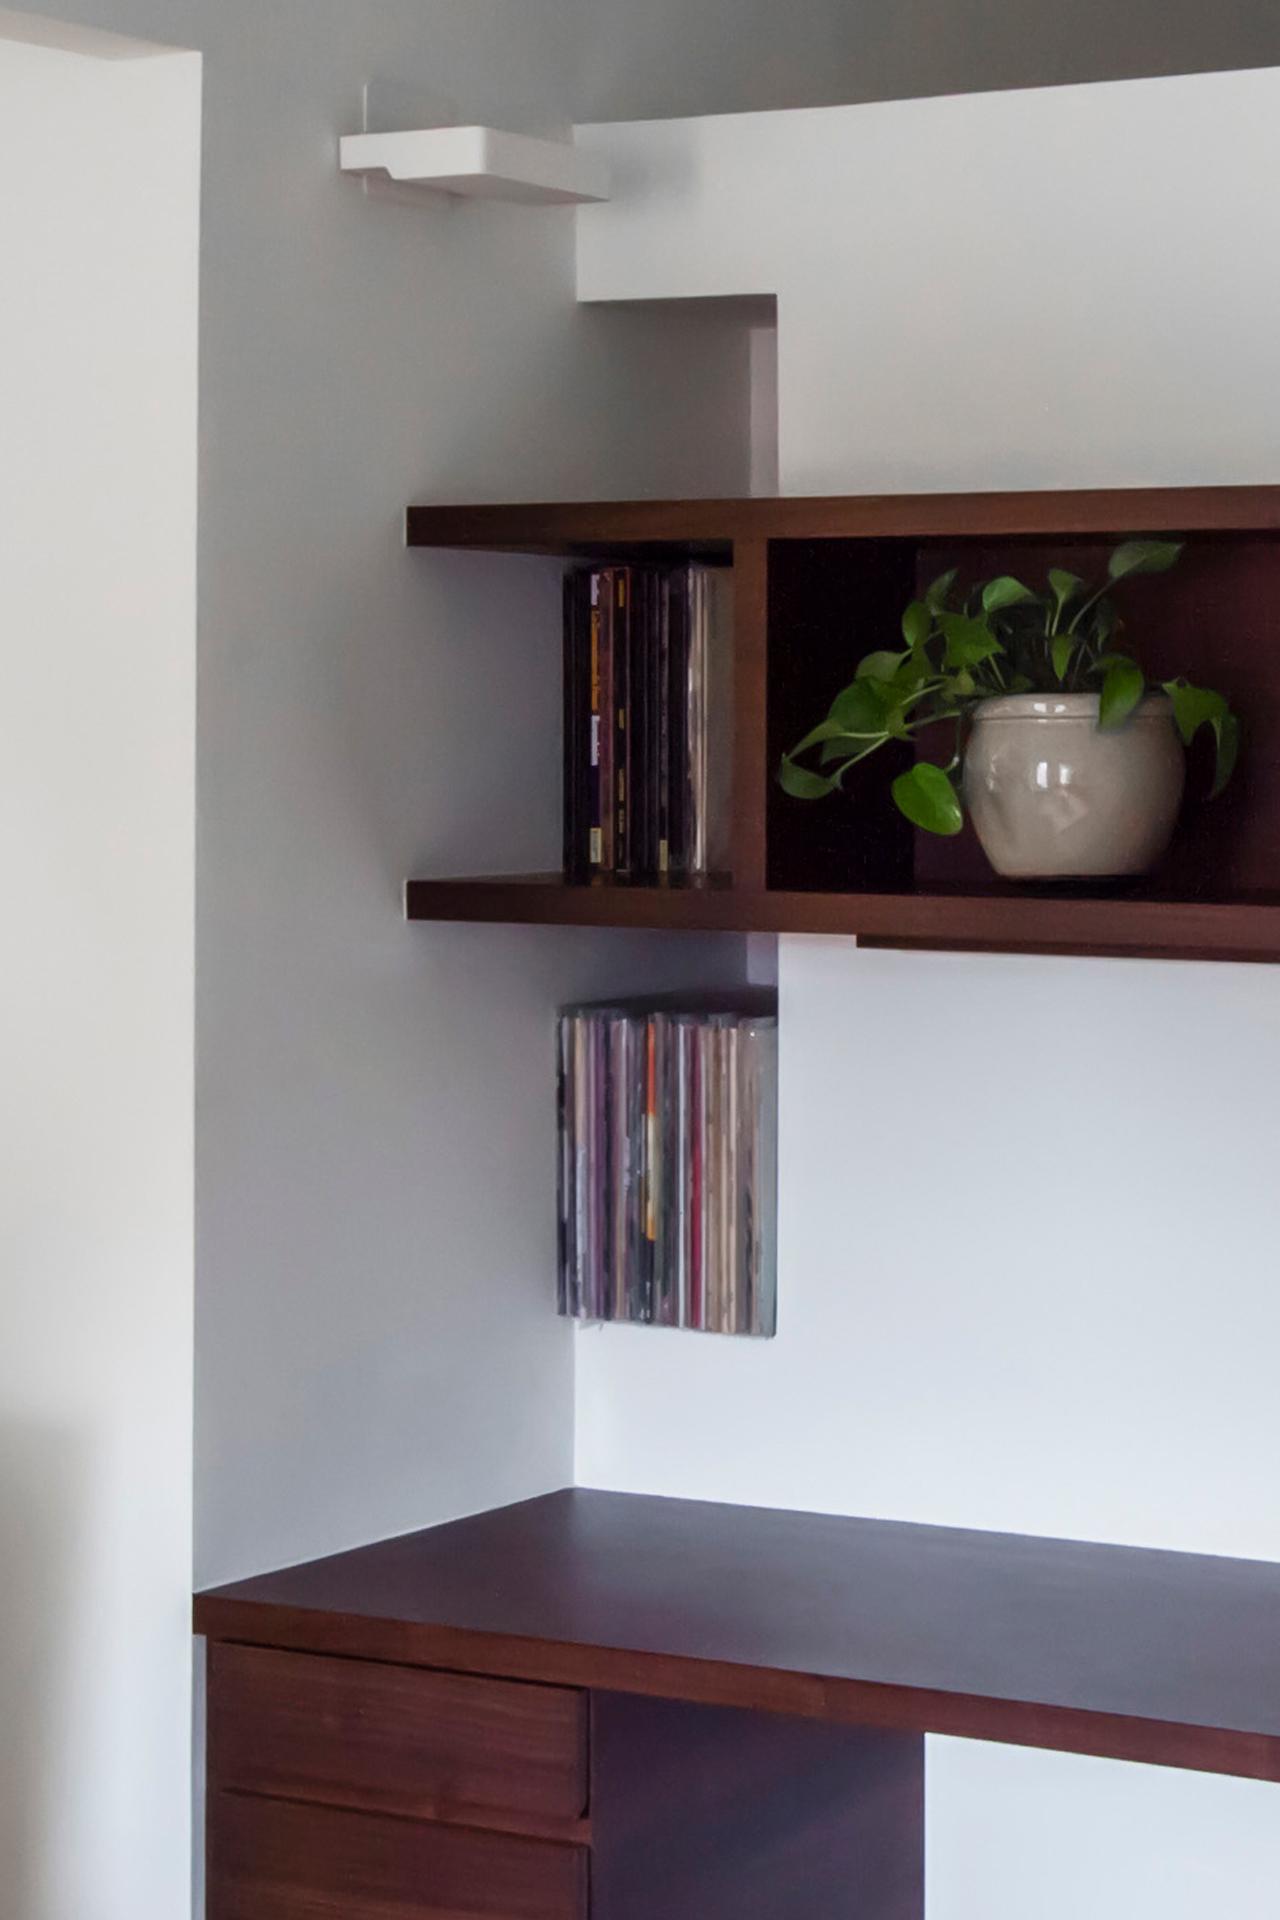 Chelsea Micro-Studio home